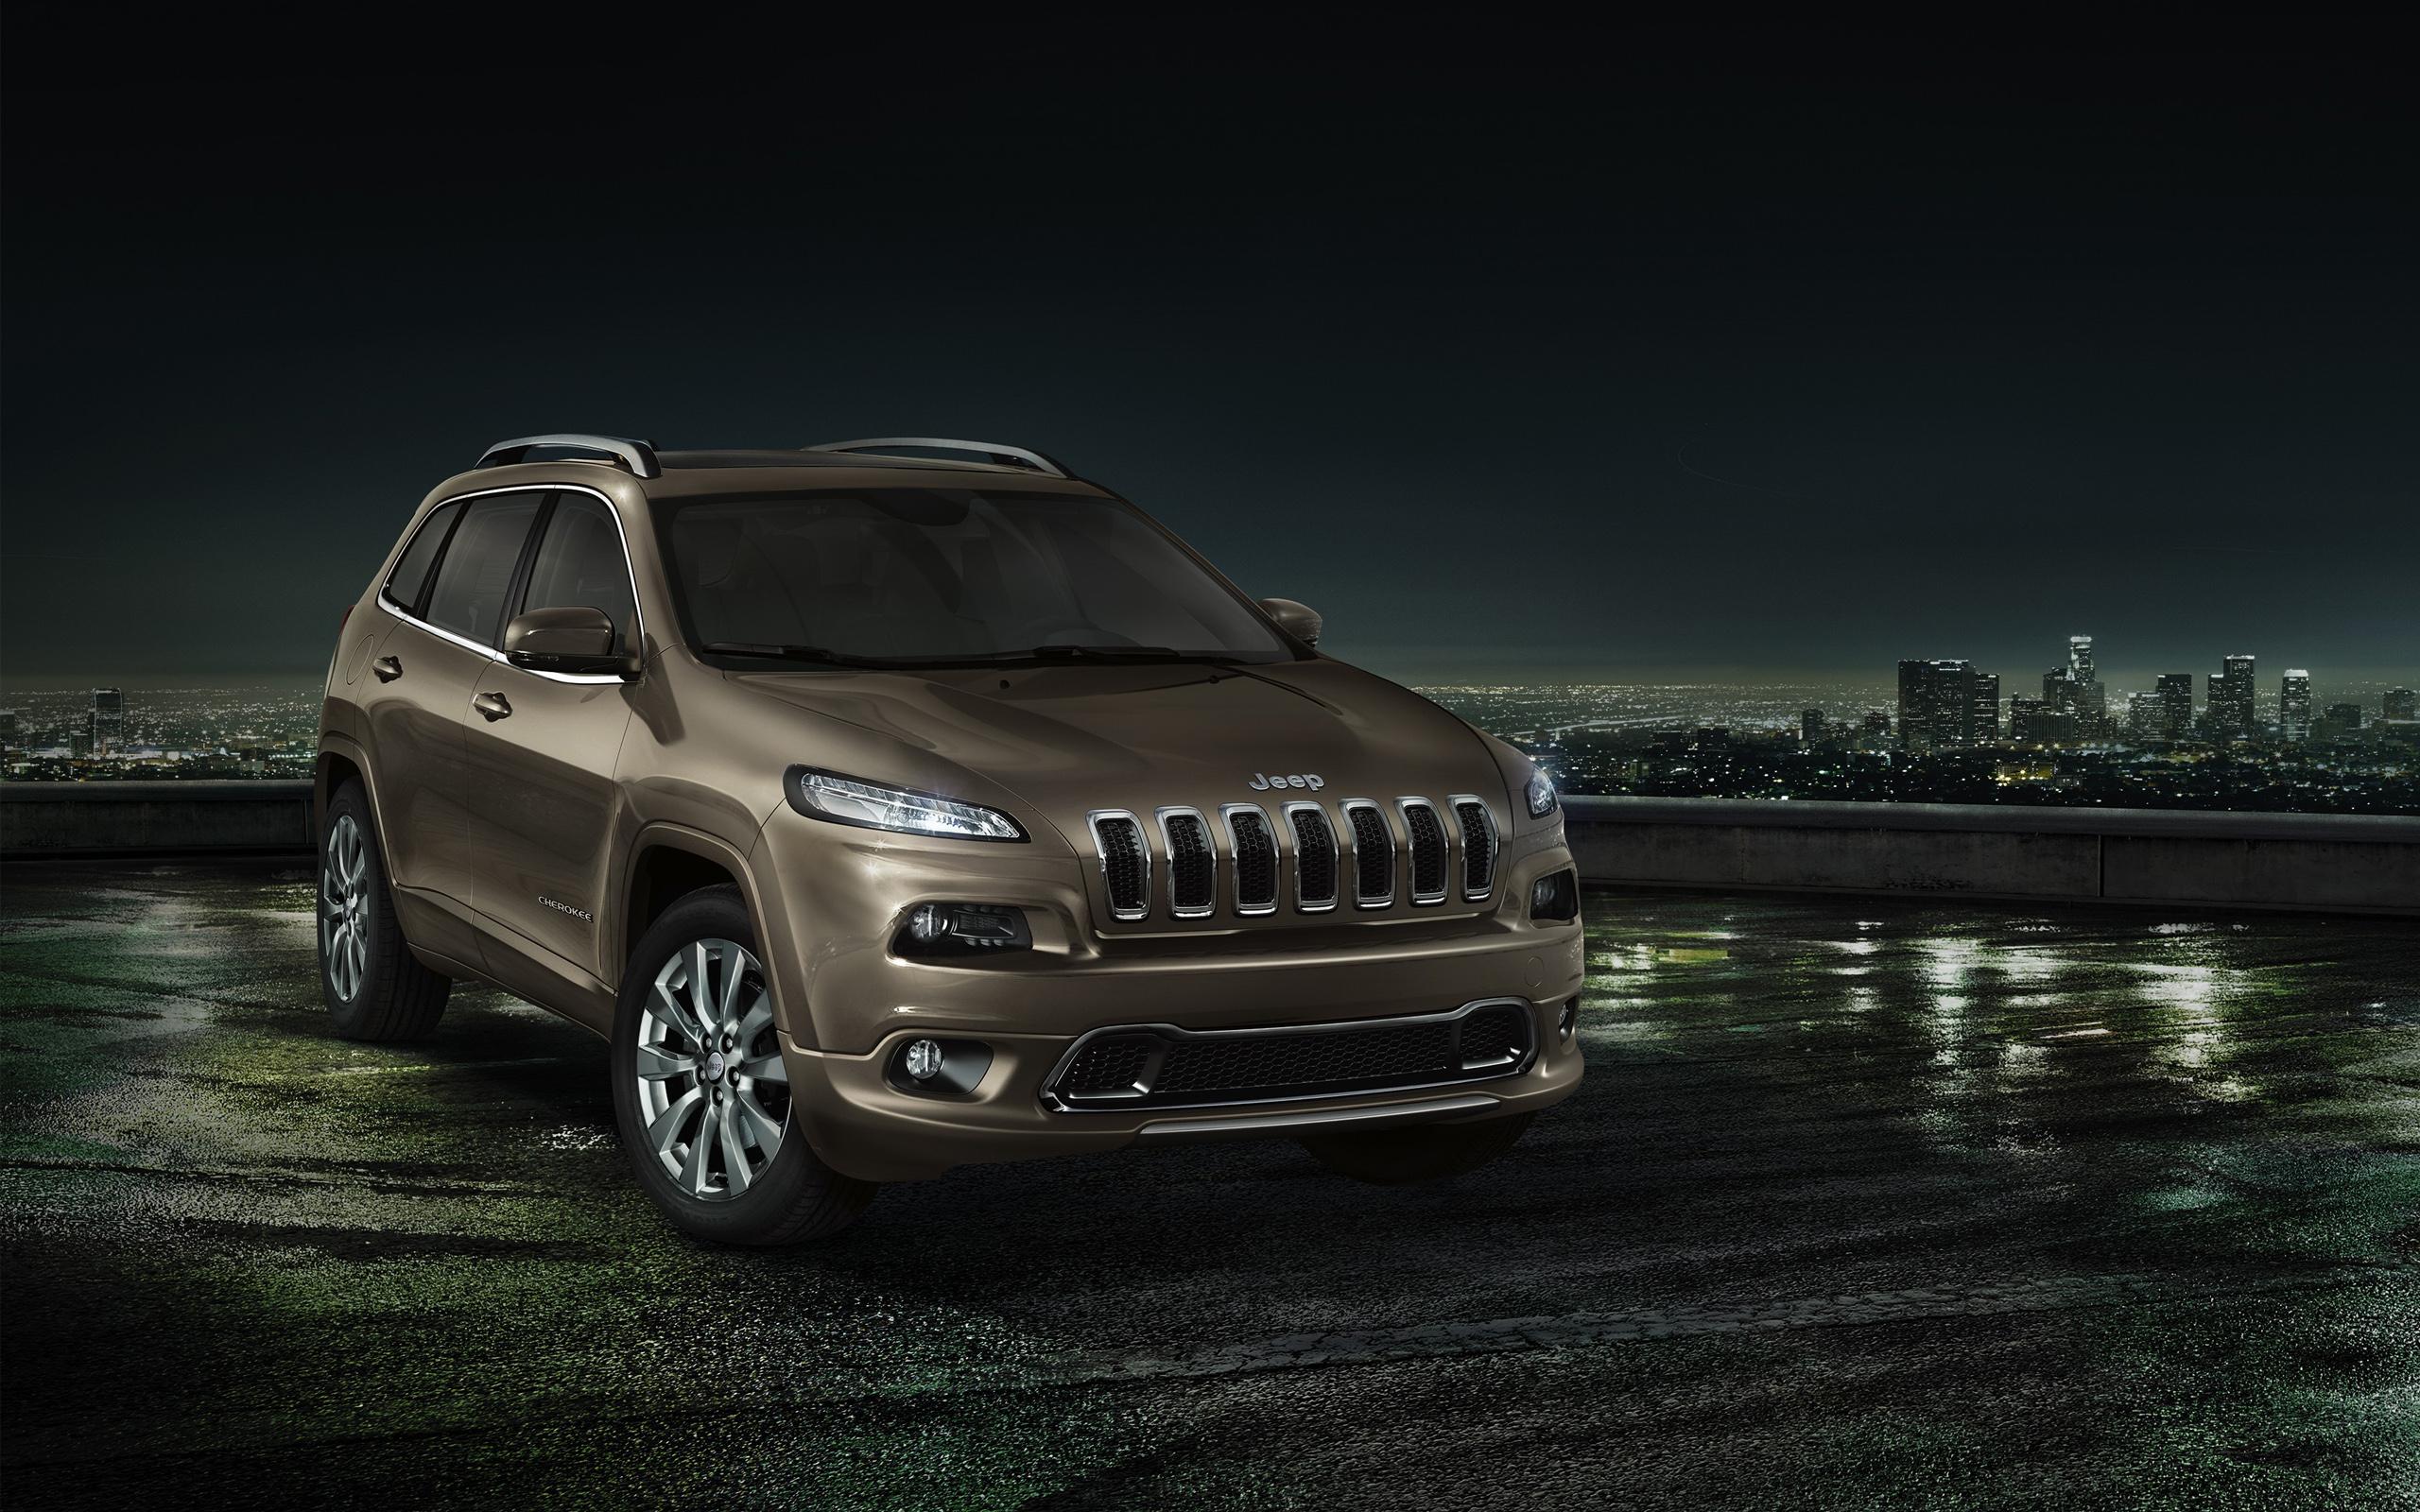 Jeep Grand Cherokee Wallpaper 6   2560 X 1600 stmednet 2560x1600